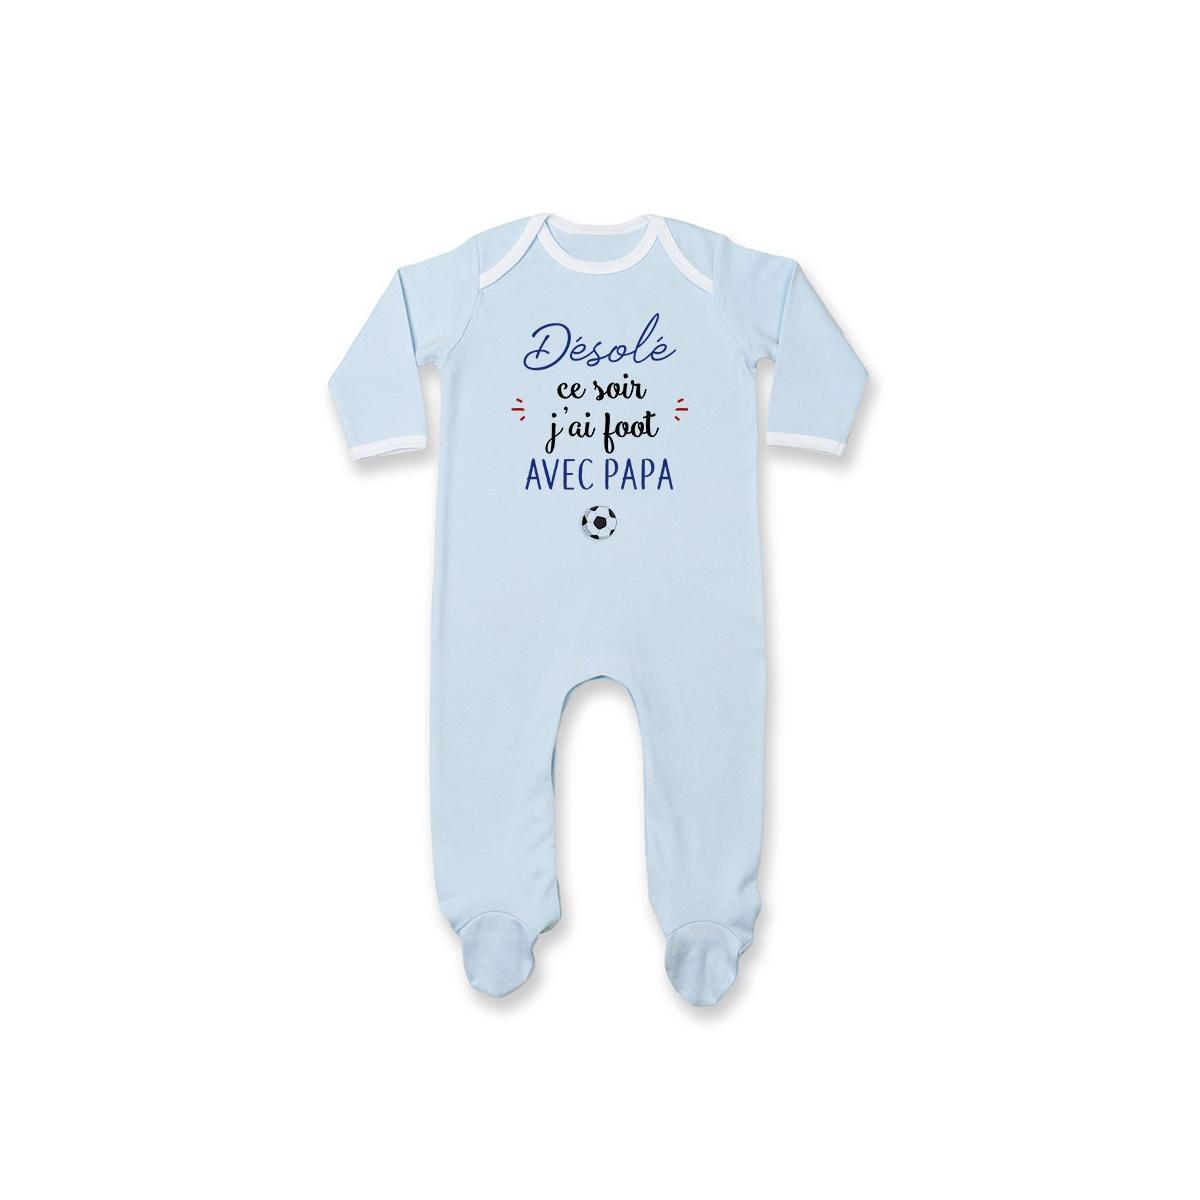 Pyjama bébé Désolé ce soir j'ai foot avec papa